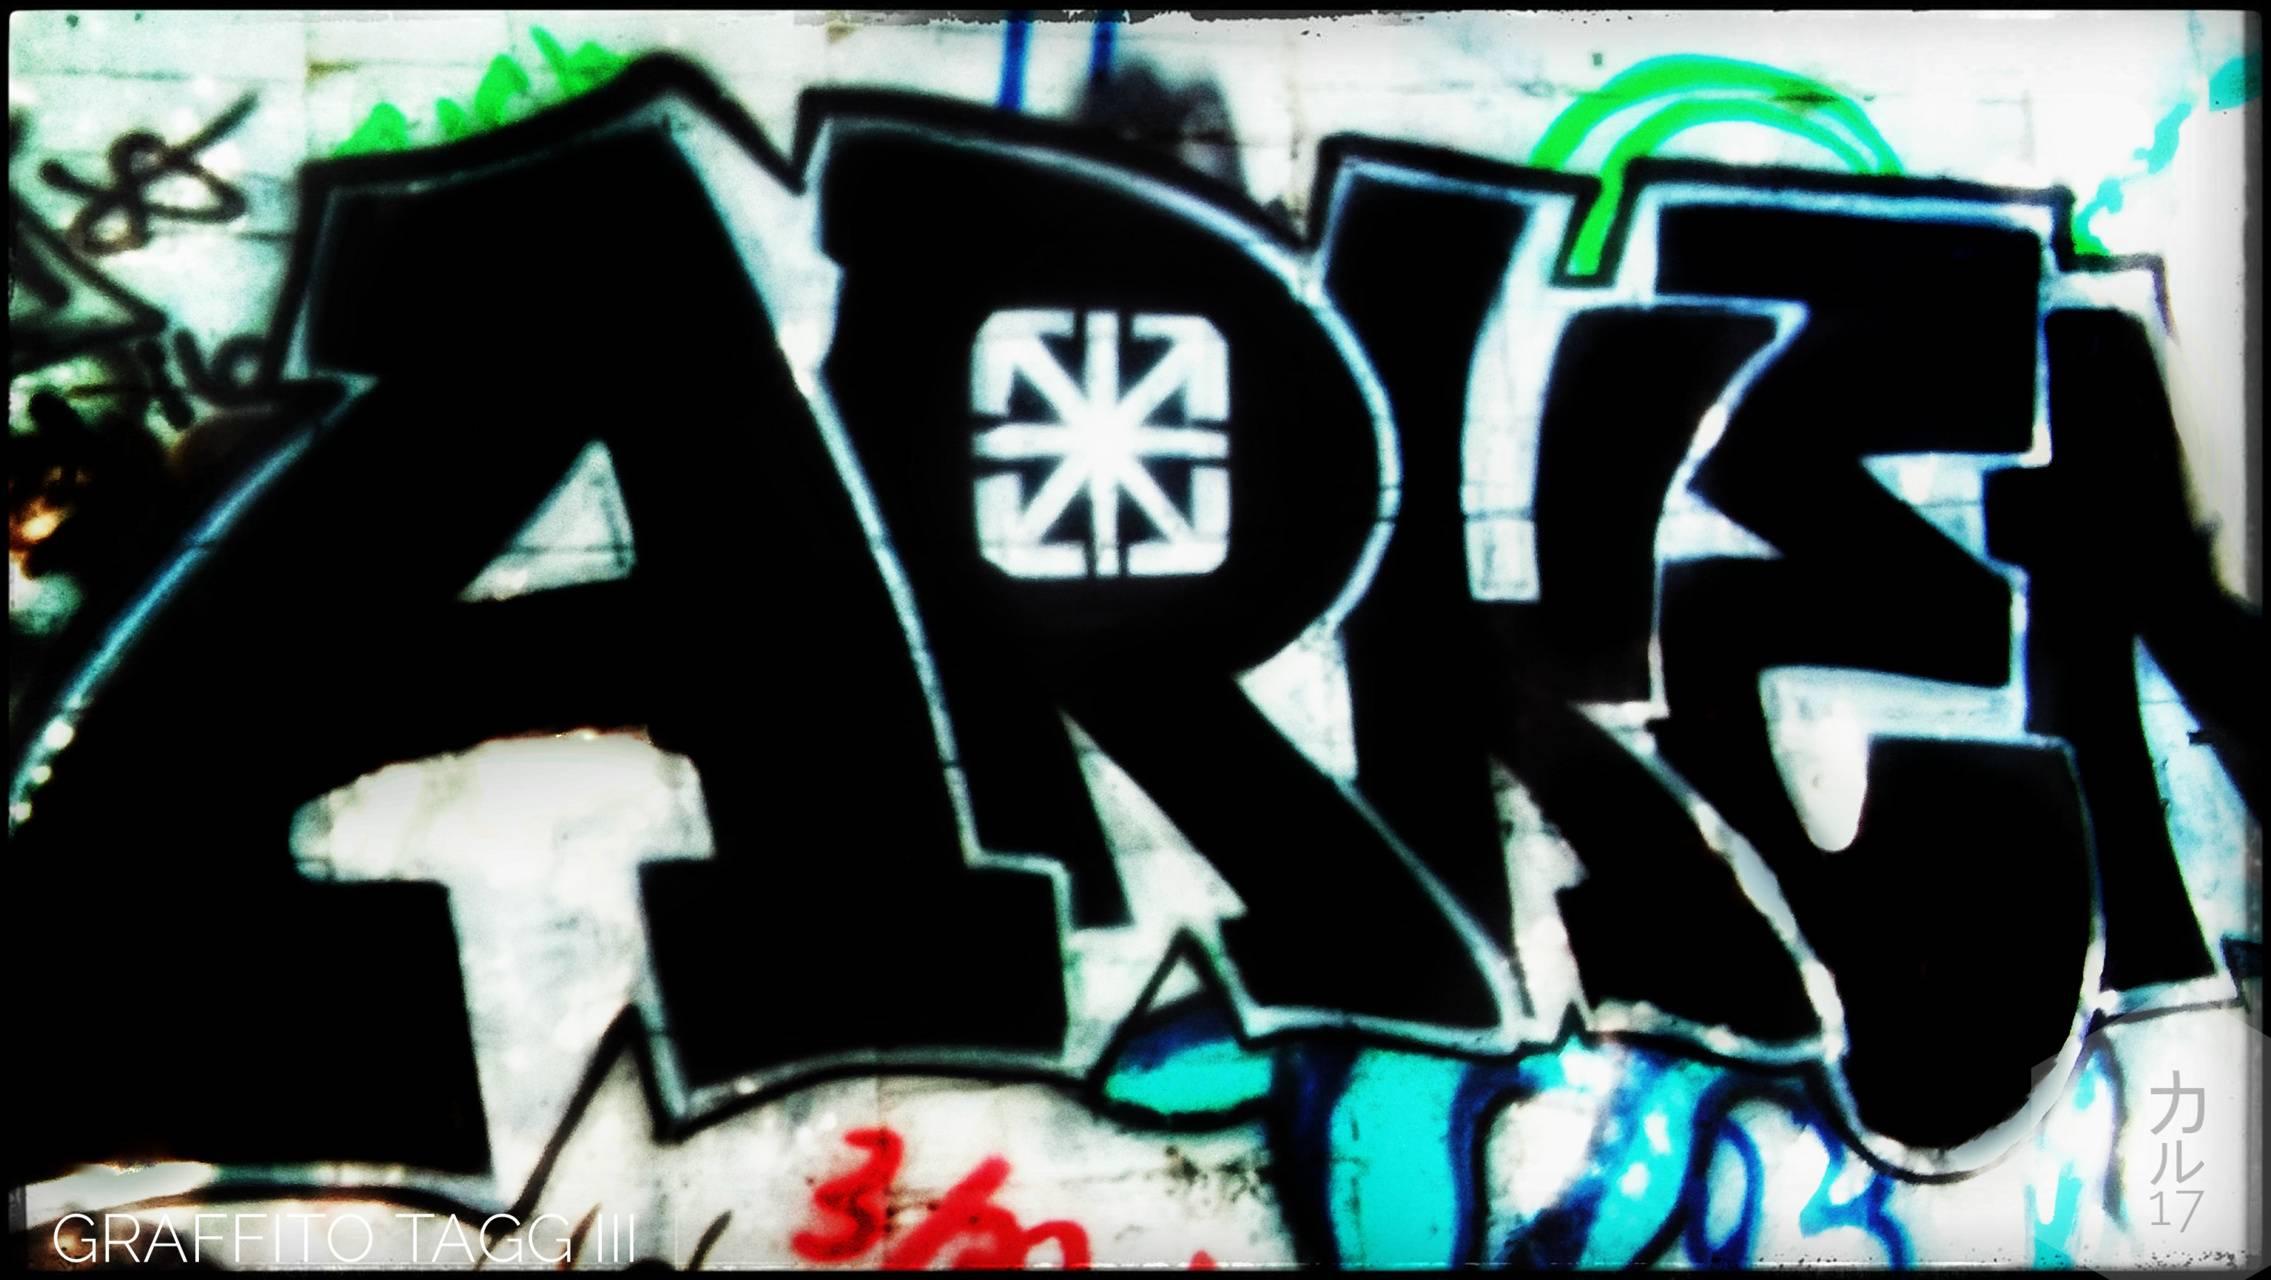 Neat-o Graffito 1